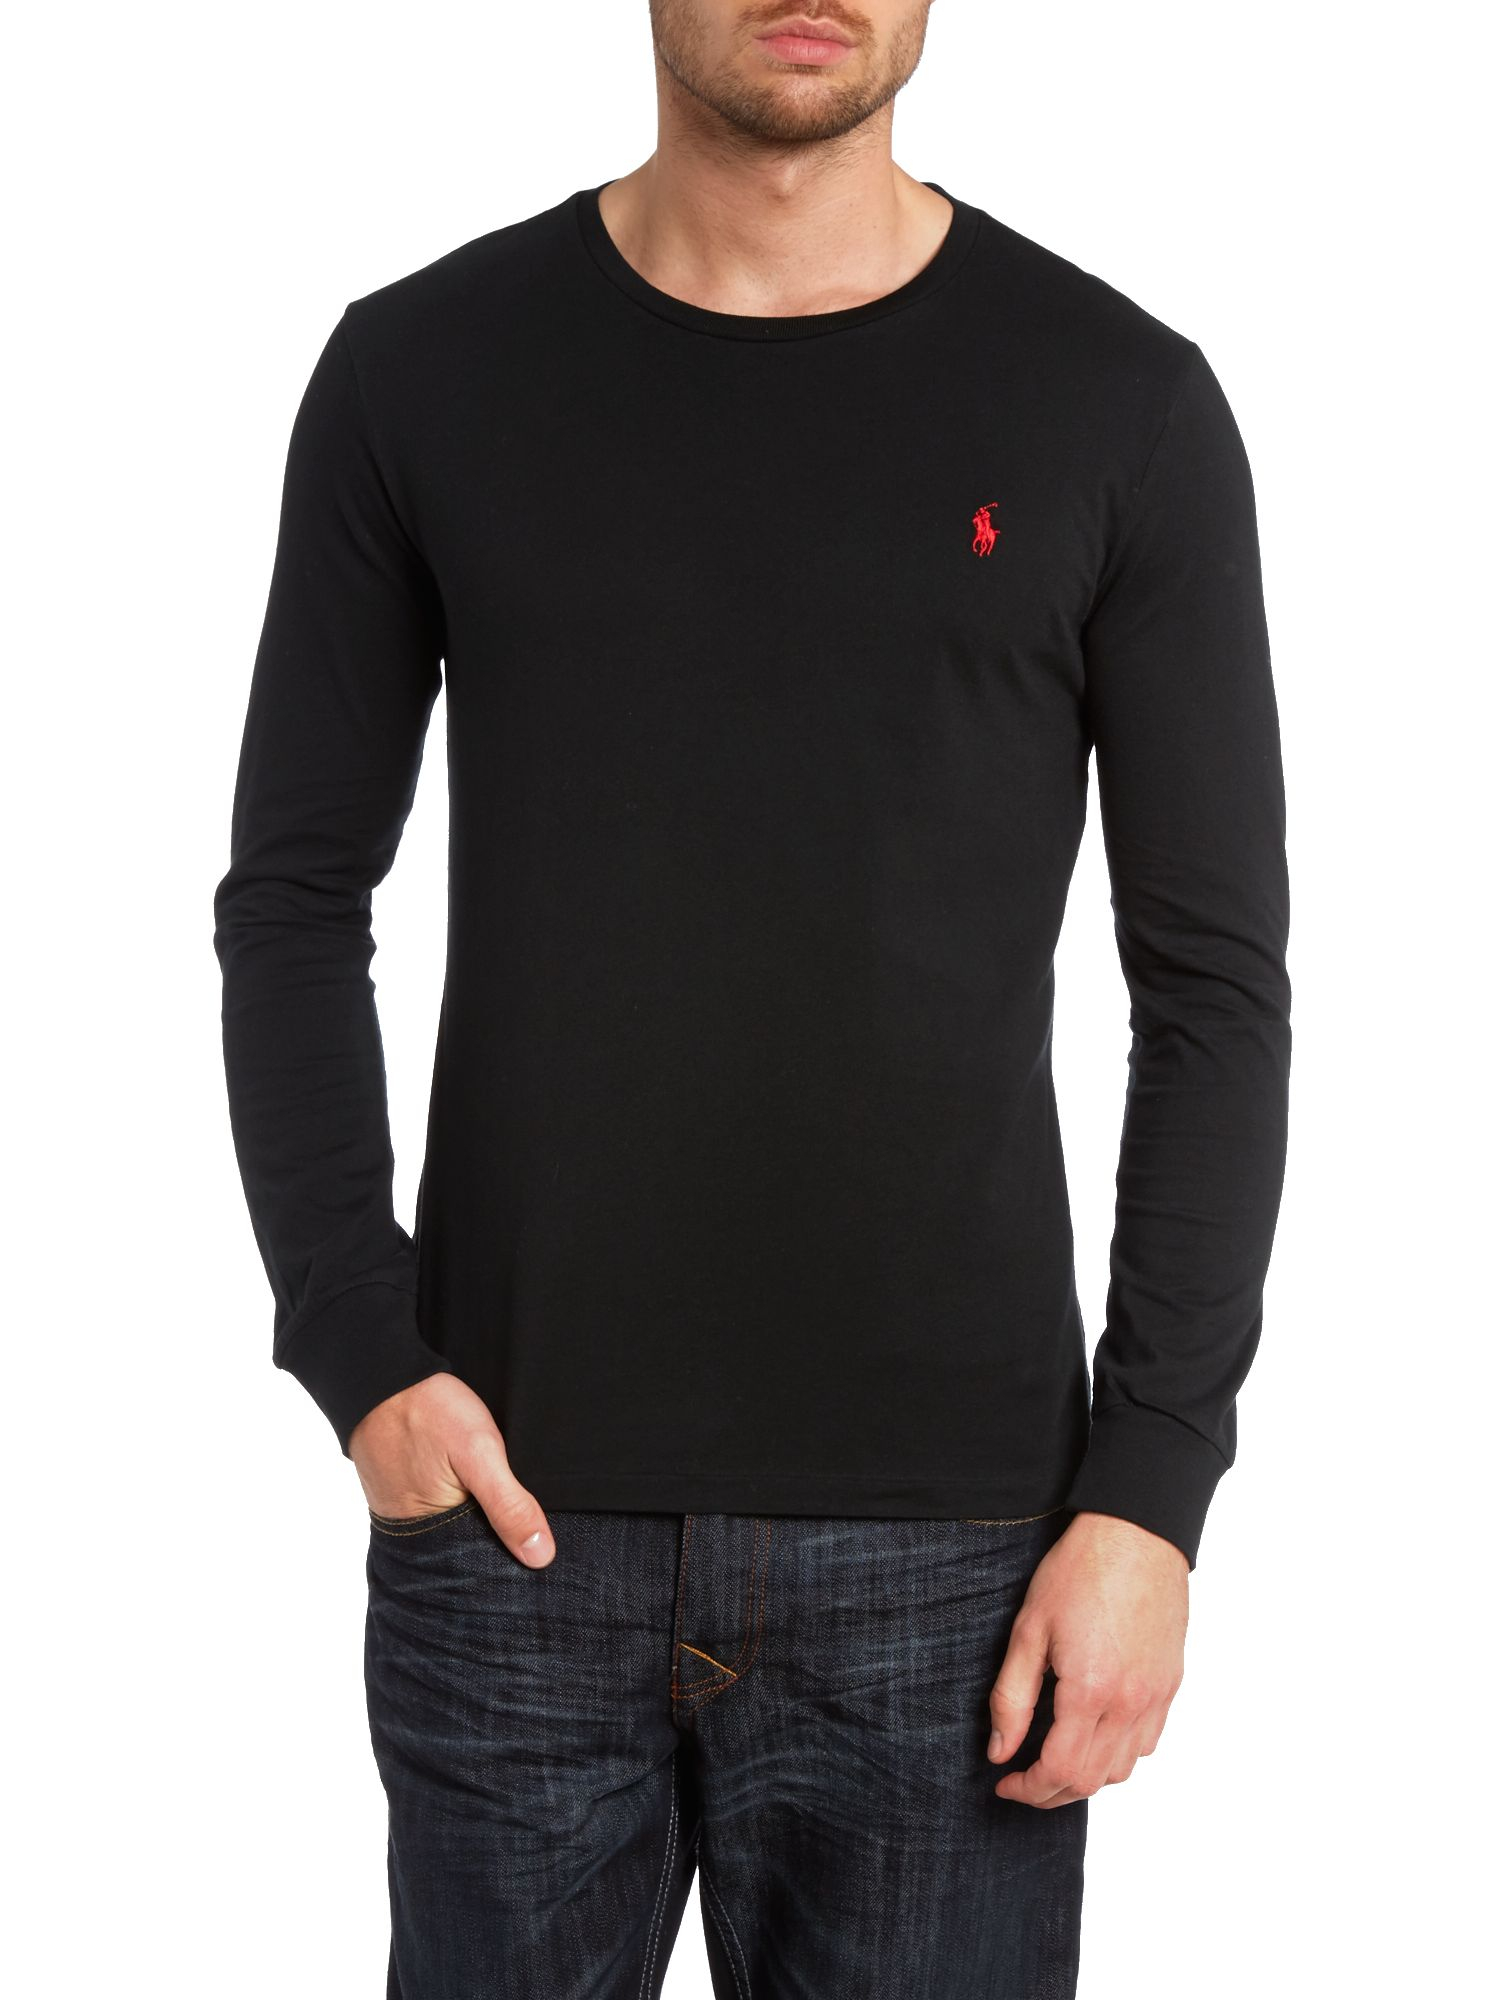 Ralph lauren crew neck t shirt black ralph lauren slip on for Crew neck sweater with collared shirt